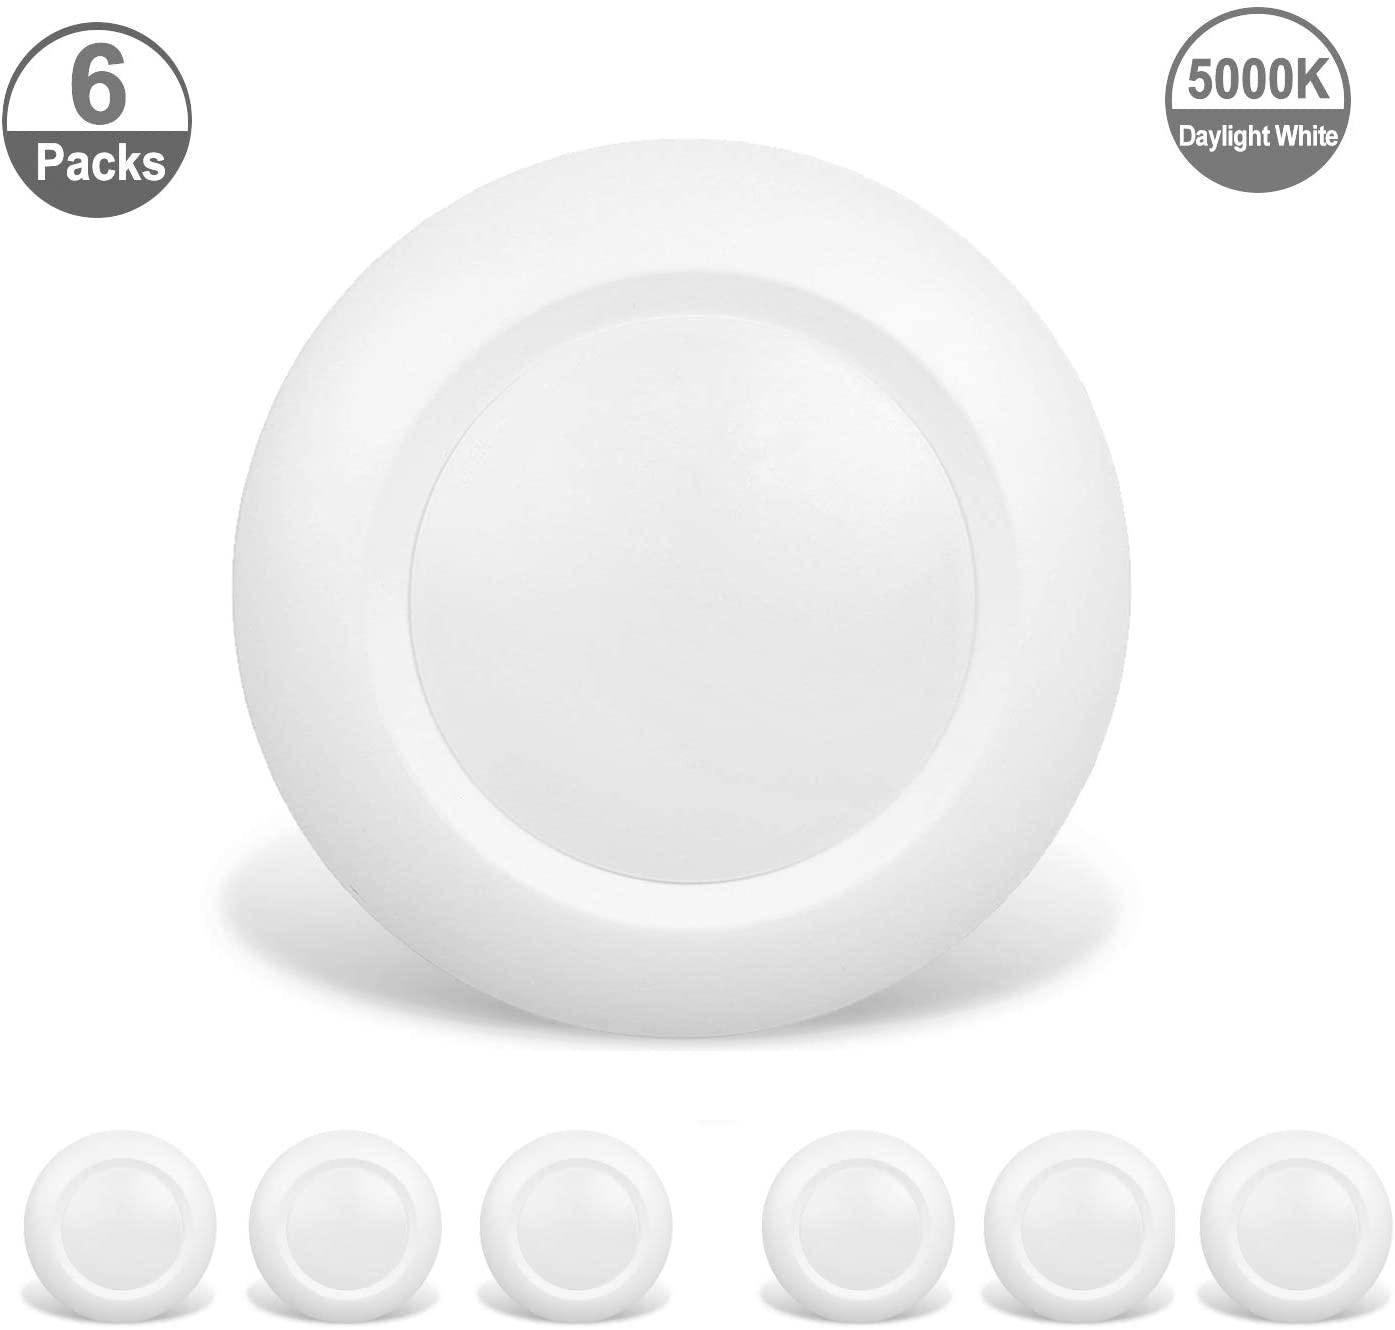 JULLISON 6 Packs 4 inch LED Low Profile Recessed & Surface Mount Disk Light, Round, 10W, 600 Lumens, 5000K Day Light White, CRI80, DOB Design, Dimmable, Energy Star, ETL Listed, White